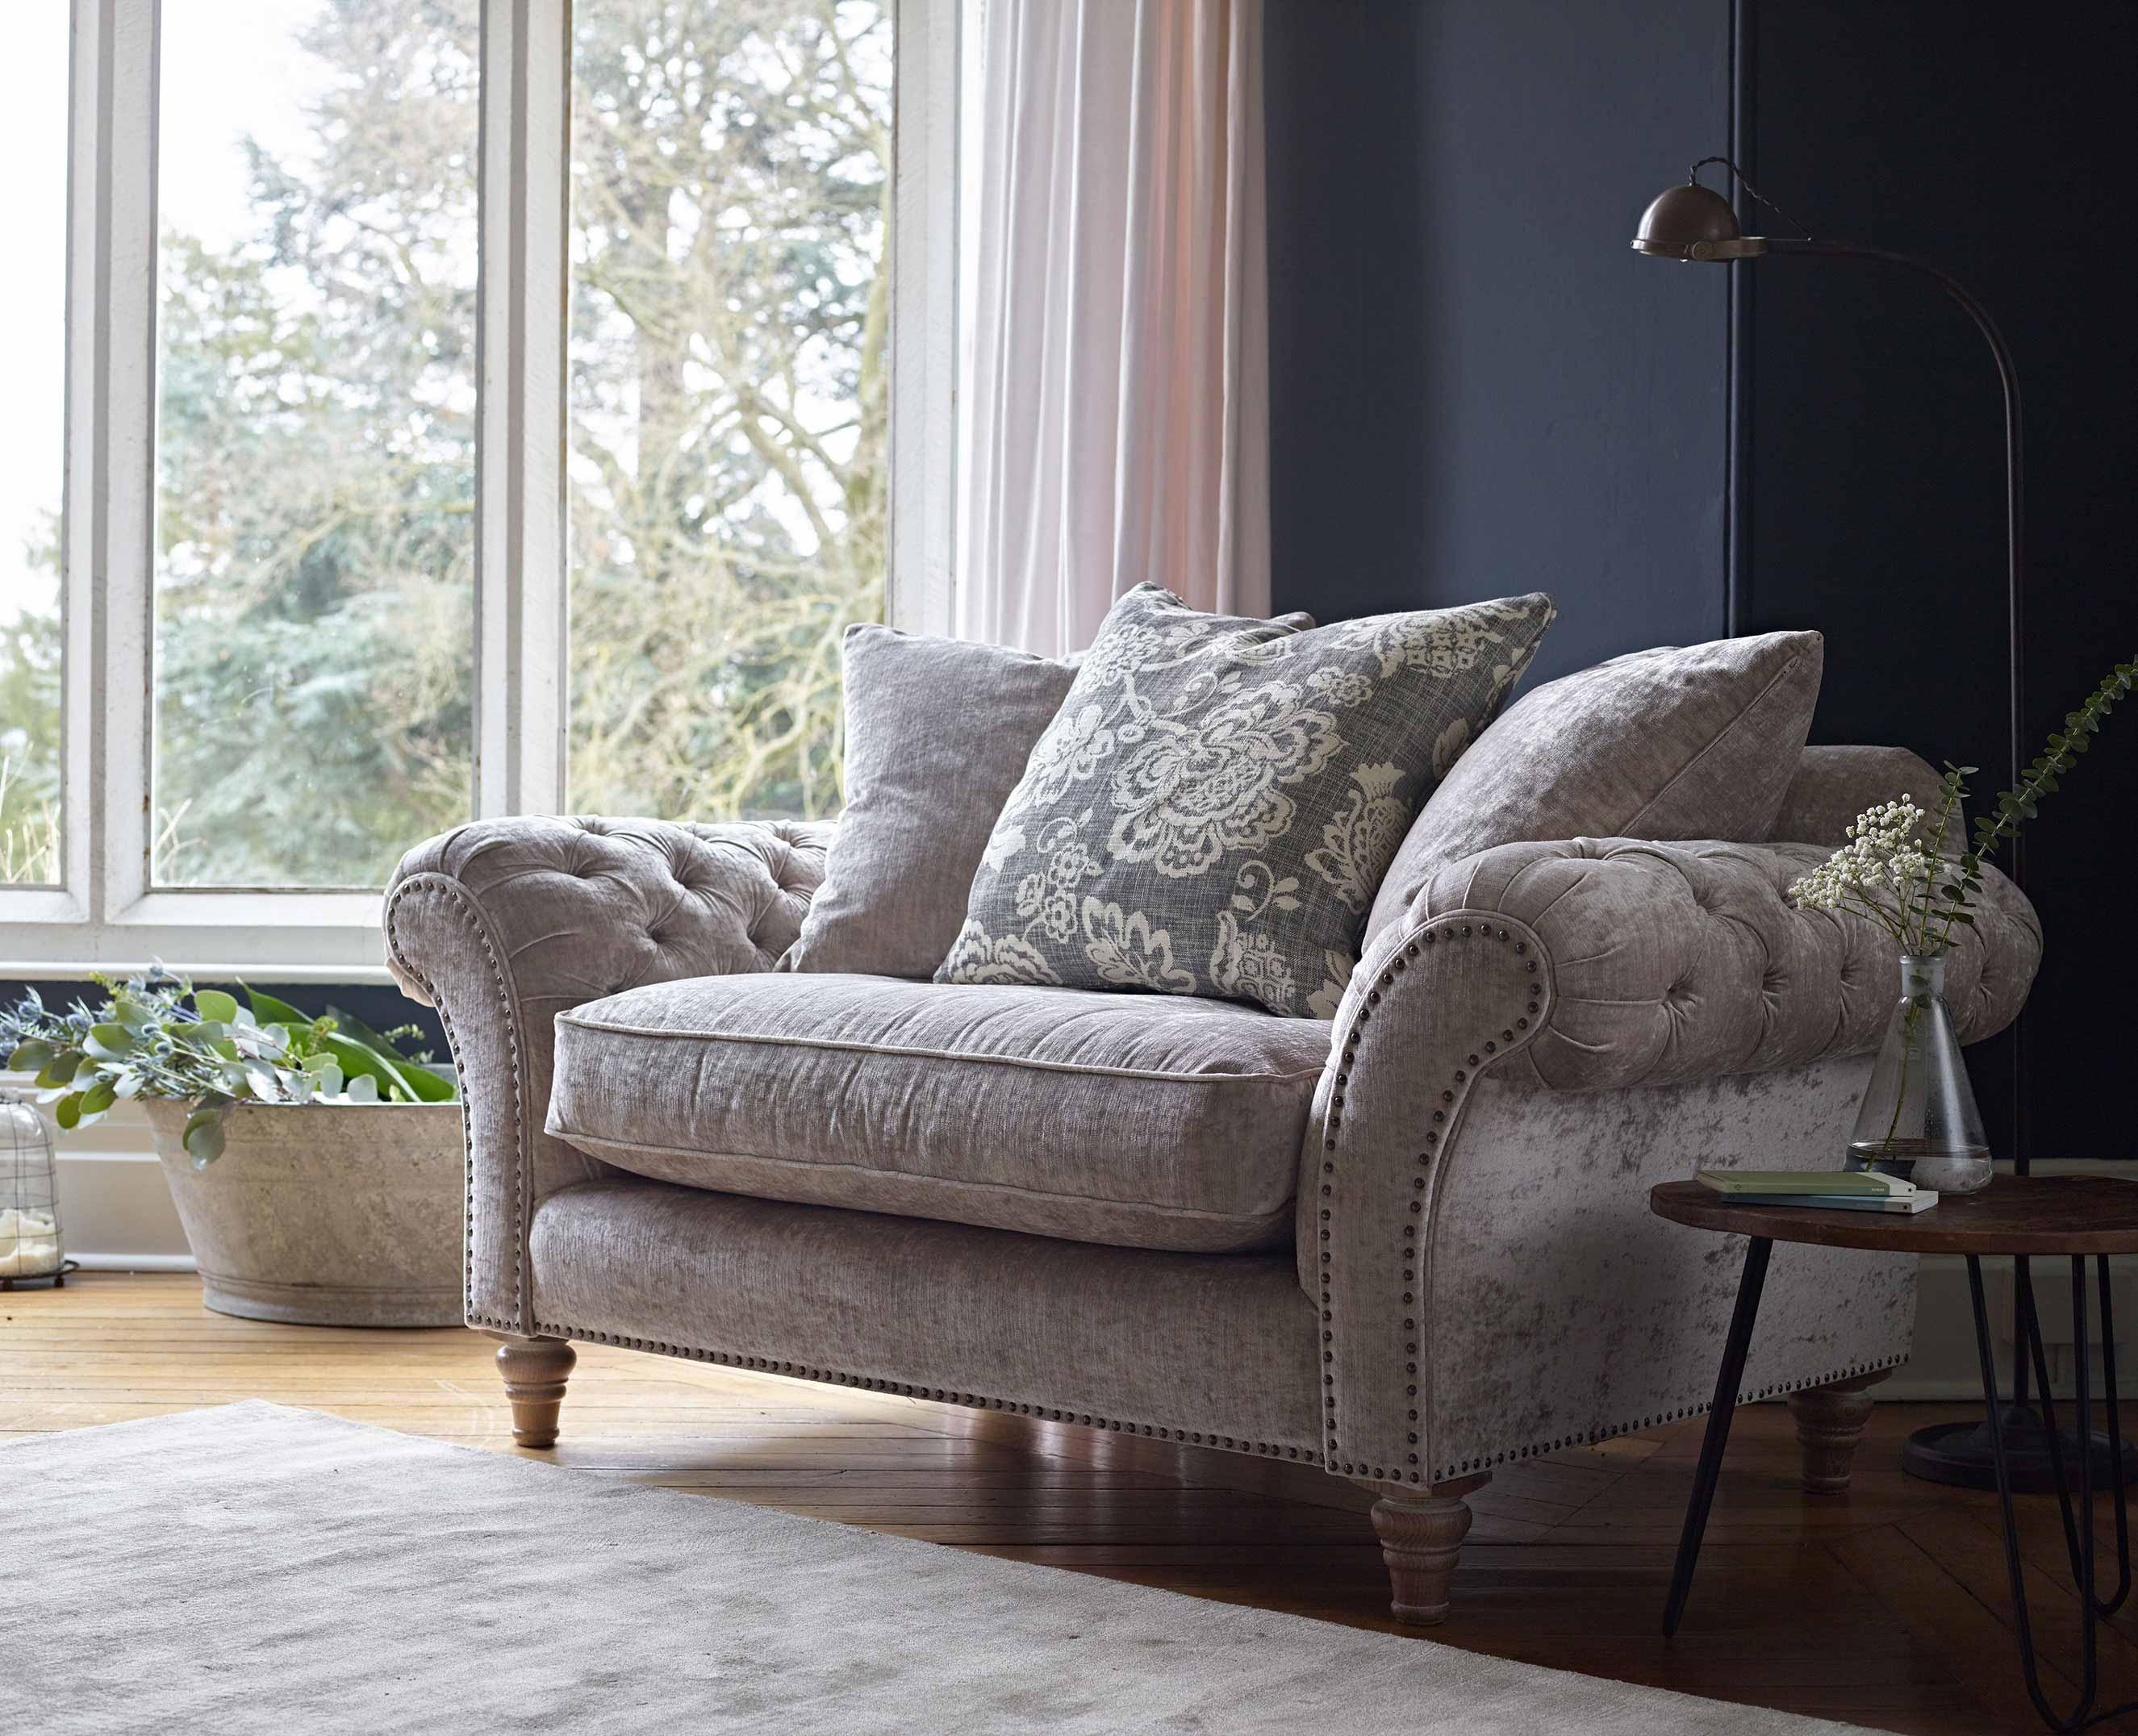 new style of sofa set ital leather home - westbridge furniture designs